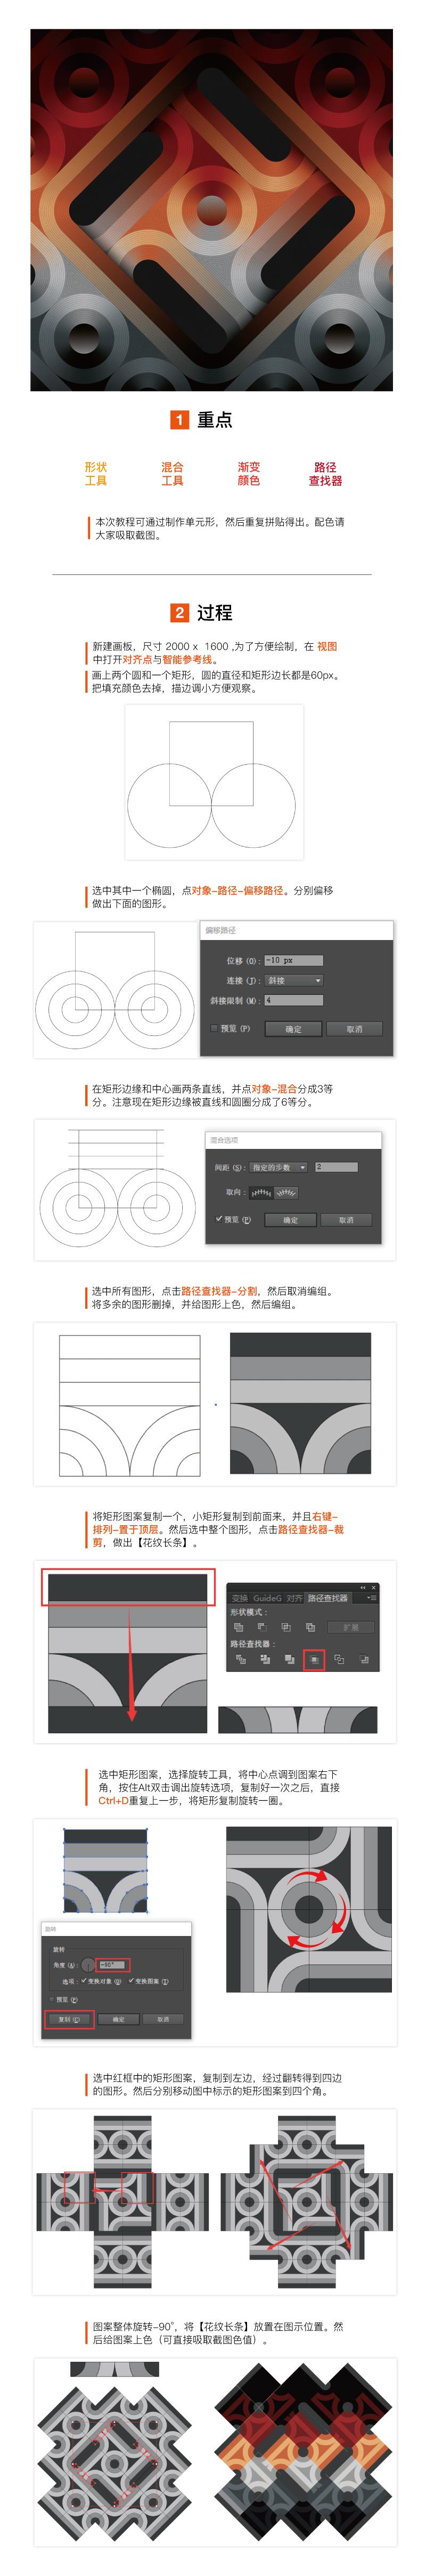 Illustrator绘制软件启动页抽象插图效果,PS教程,思缘教程网